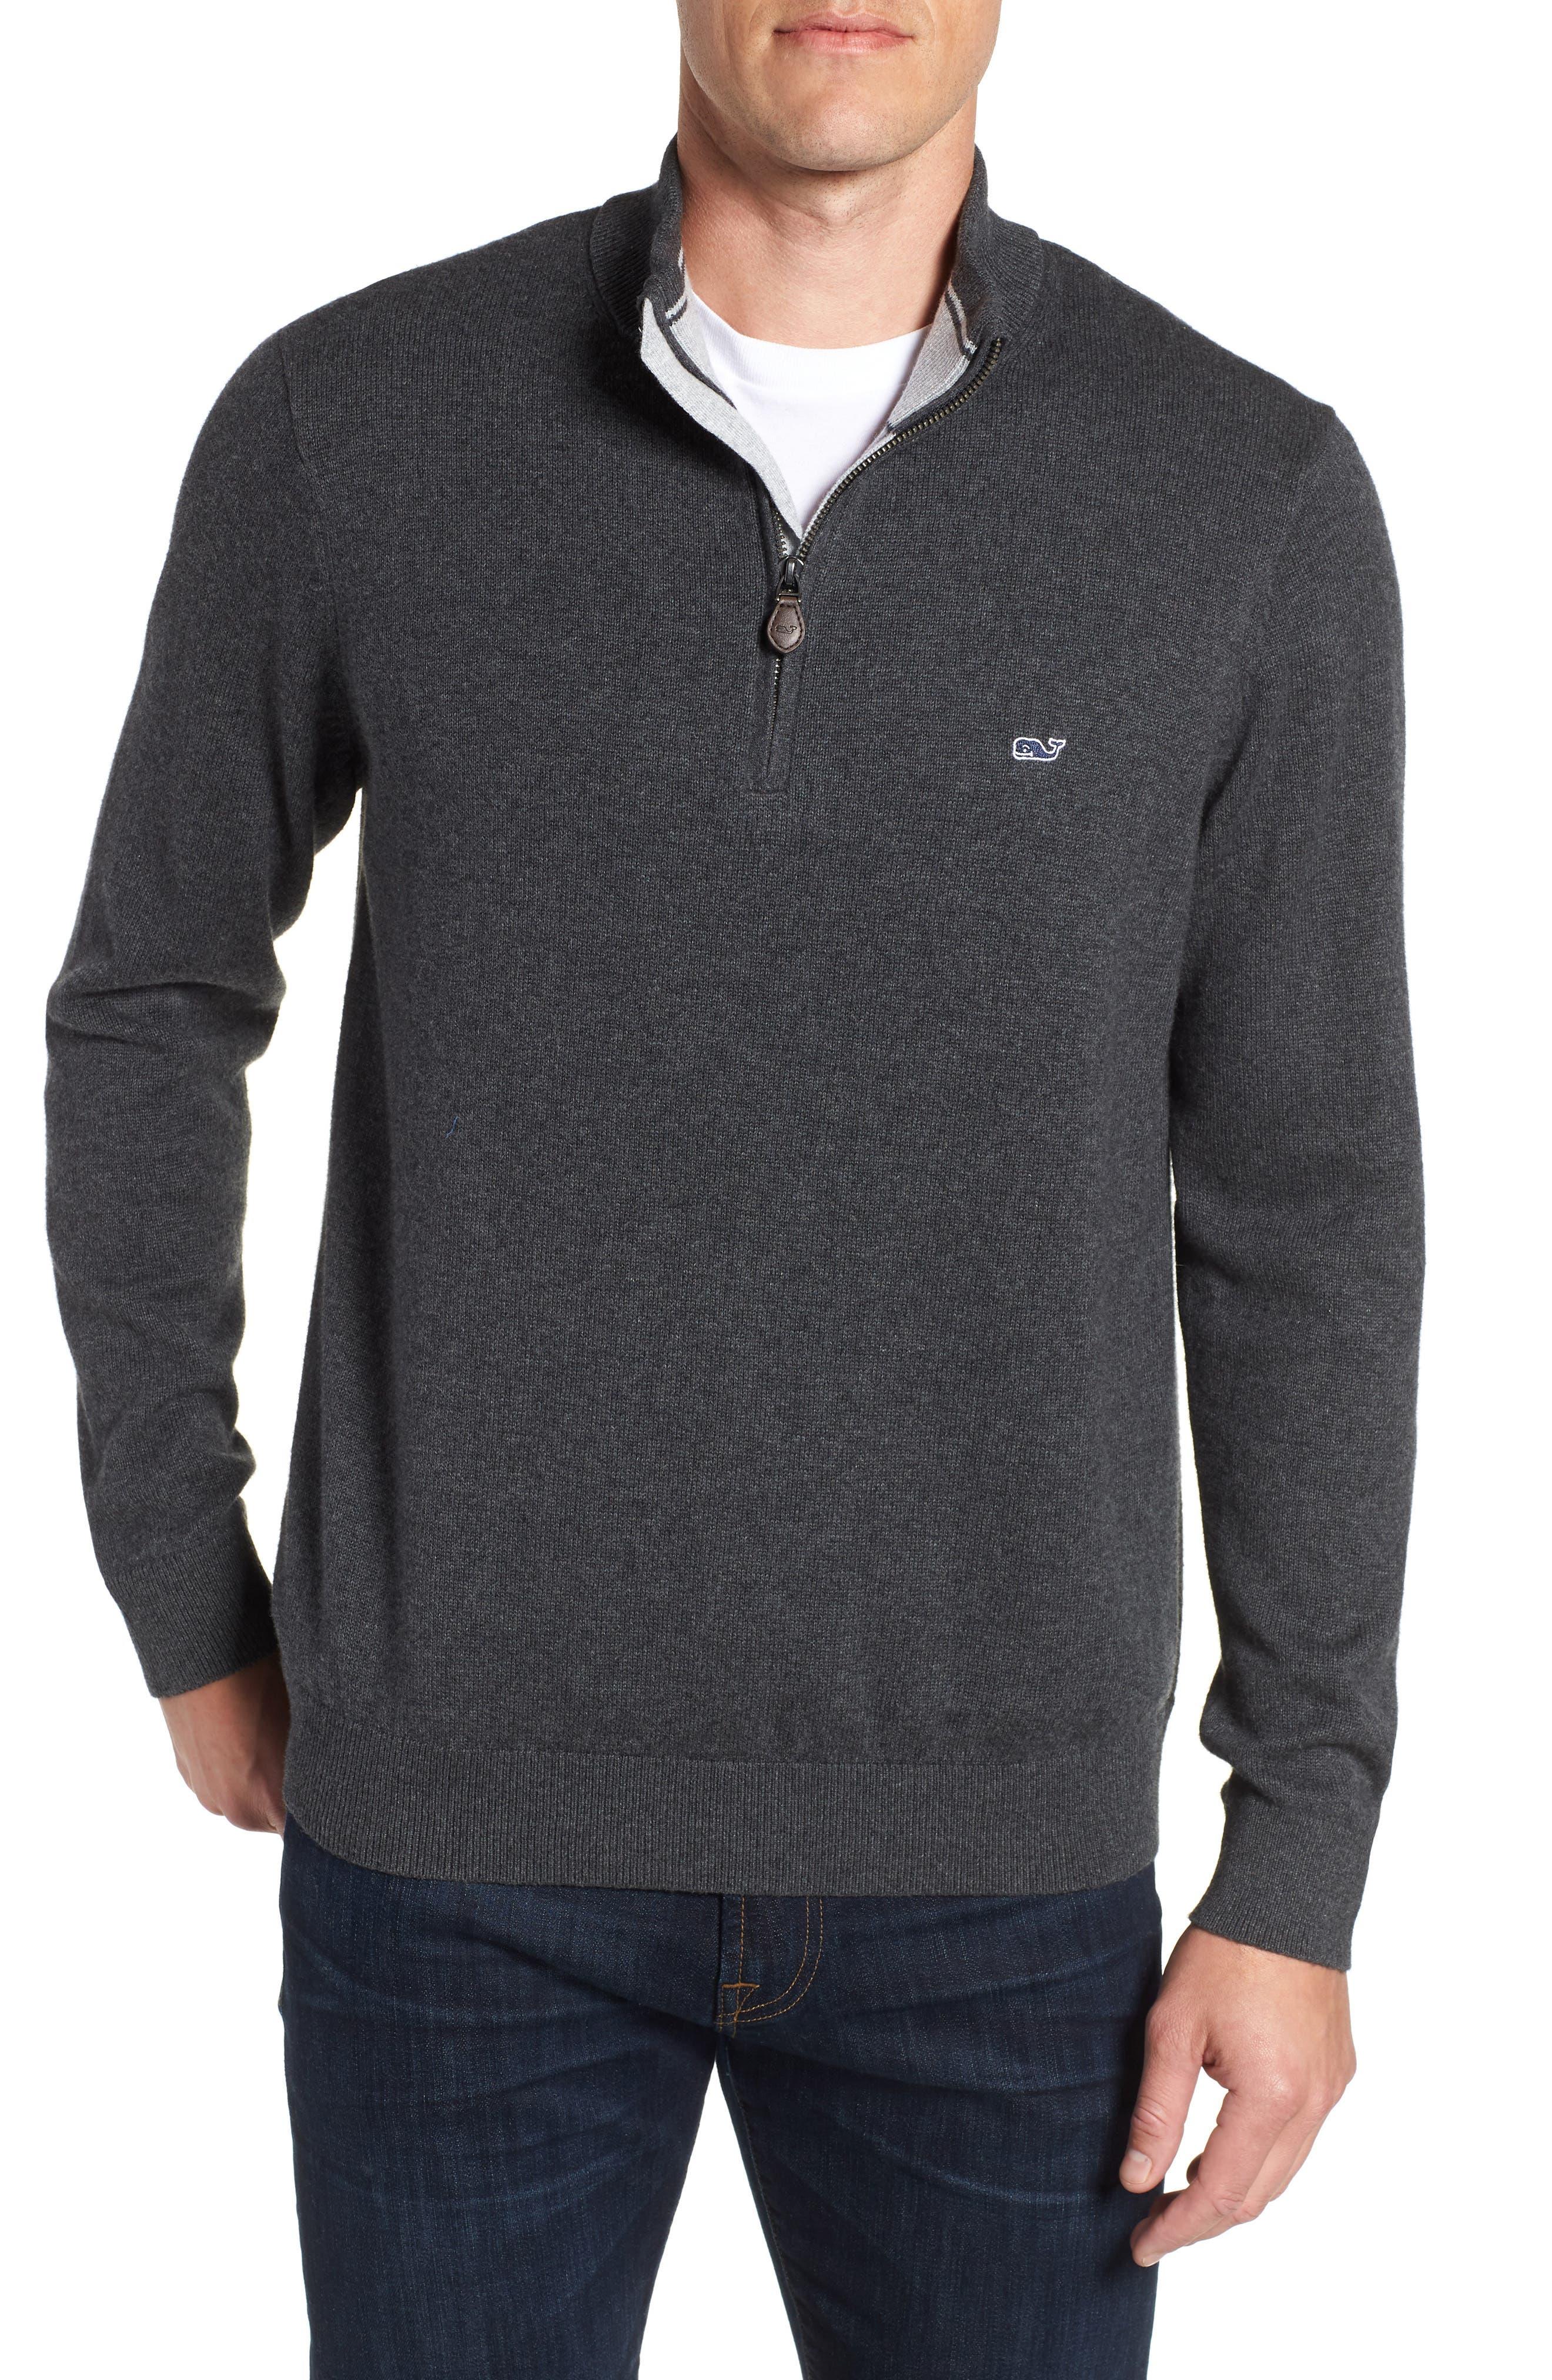 VINEYARD VINES Palm Beach Quarter-Zip Sweater in Charcoal Heather